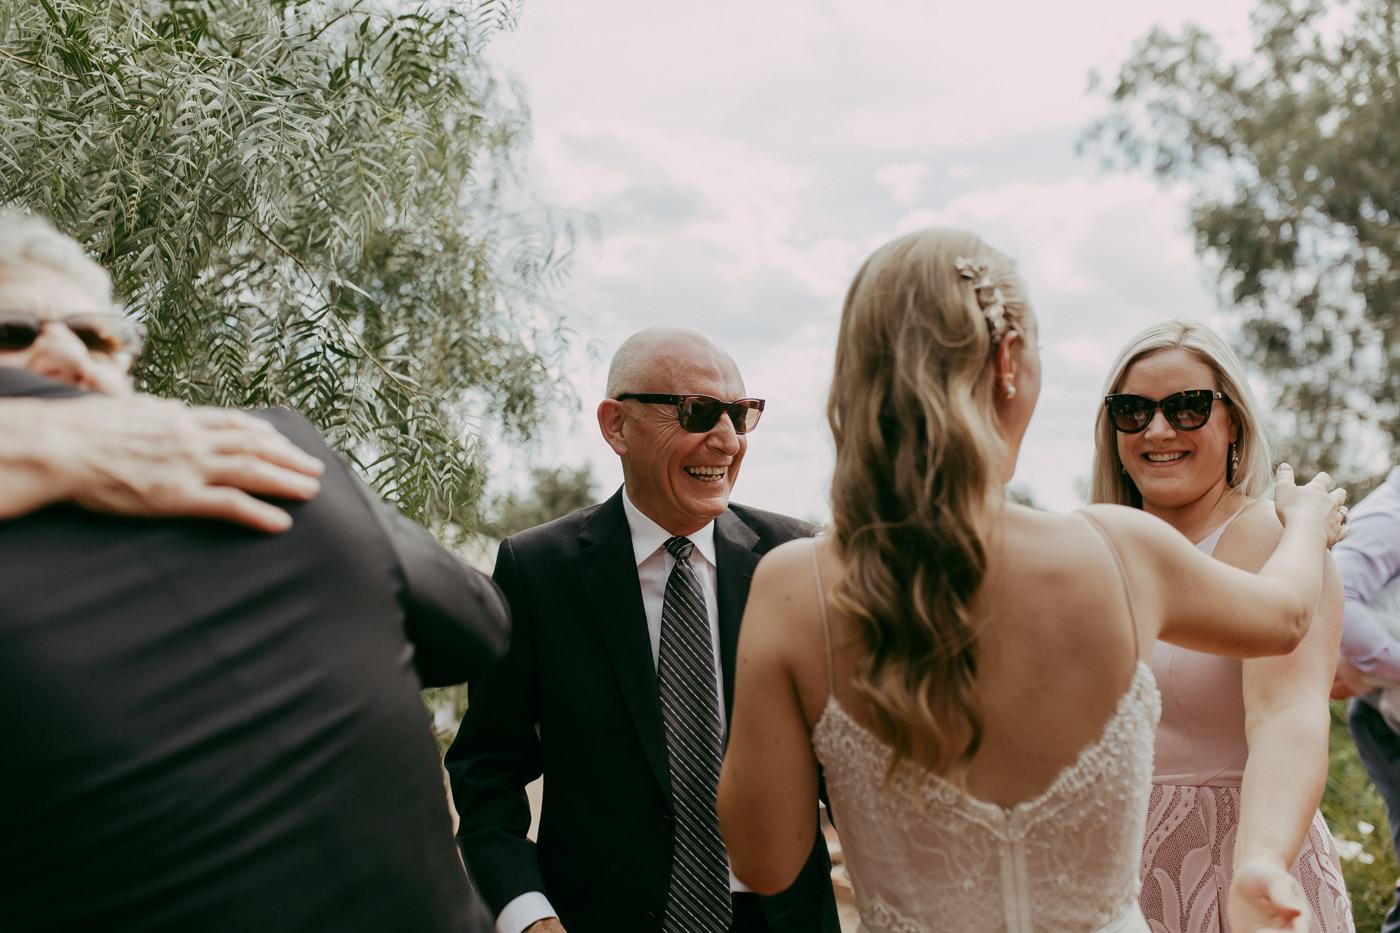 Anthony & Eliet - Wagga Wagga Wedding - Country NSW - Samantha Heather Photography-113.jpg